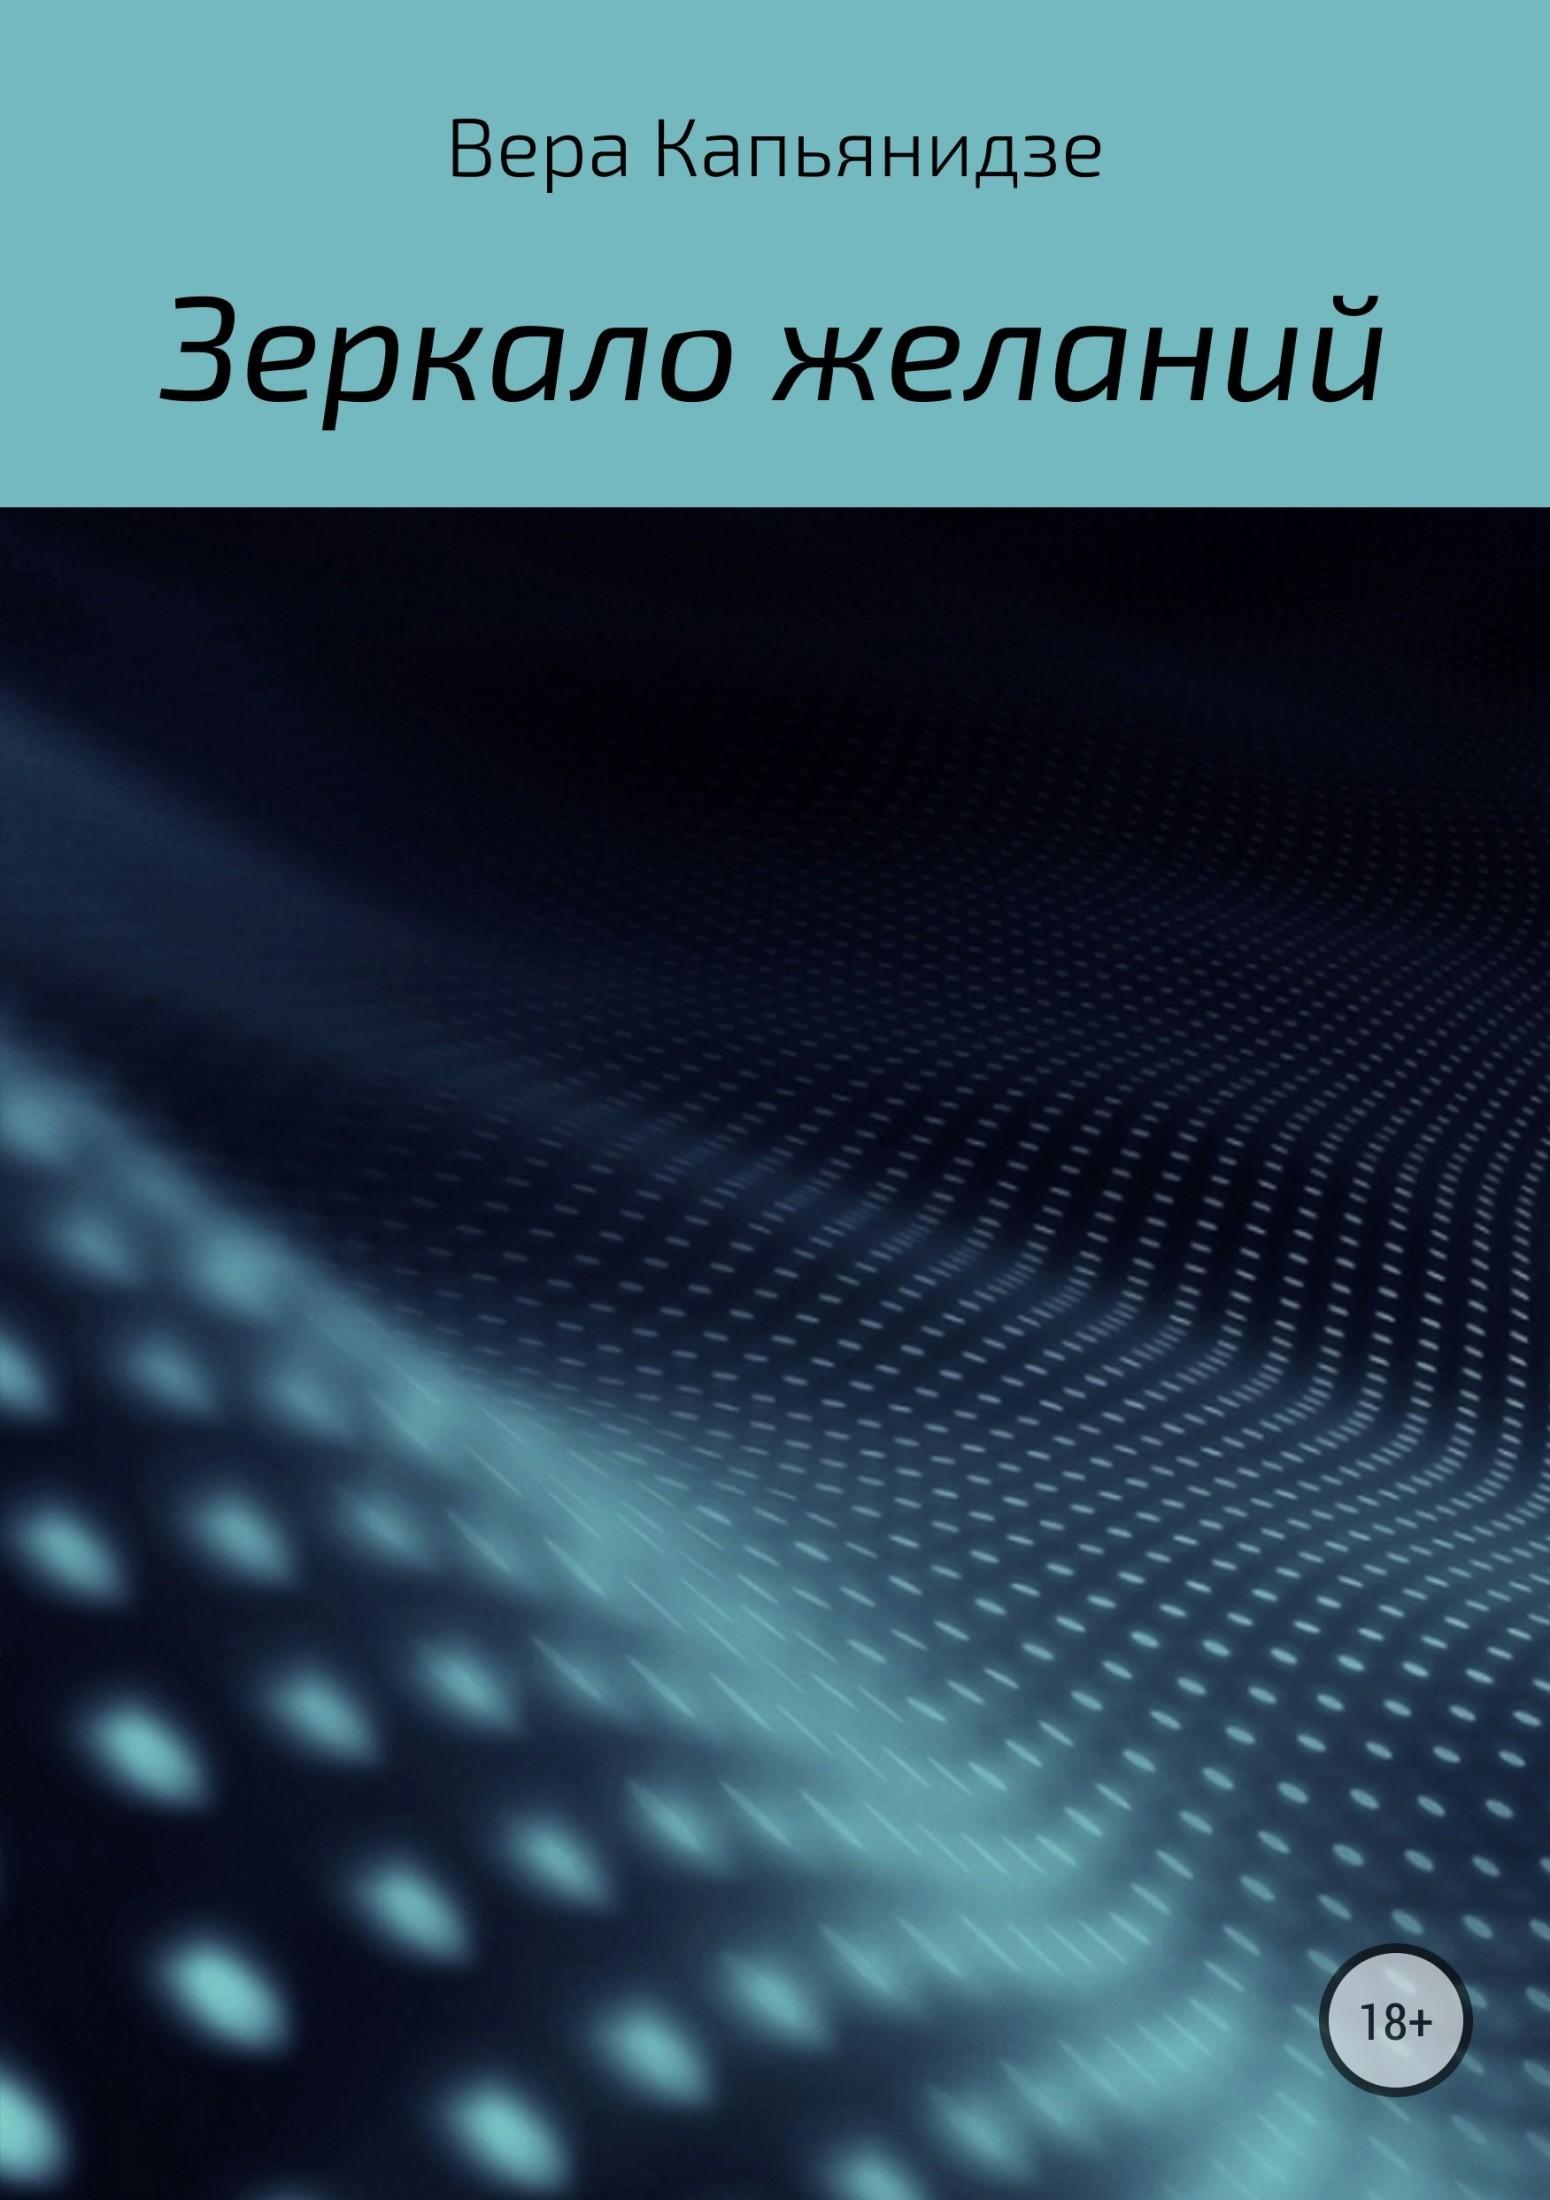 Вера Капьянидзе. Зеркало желаний